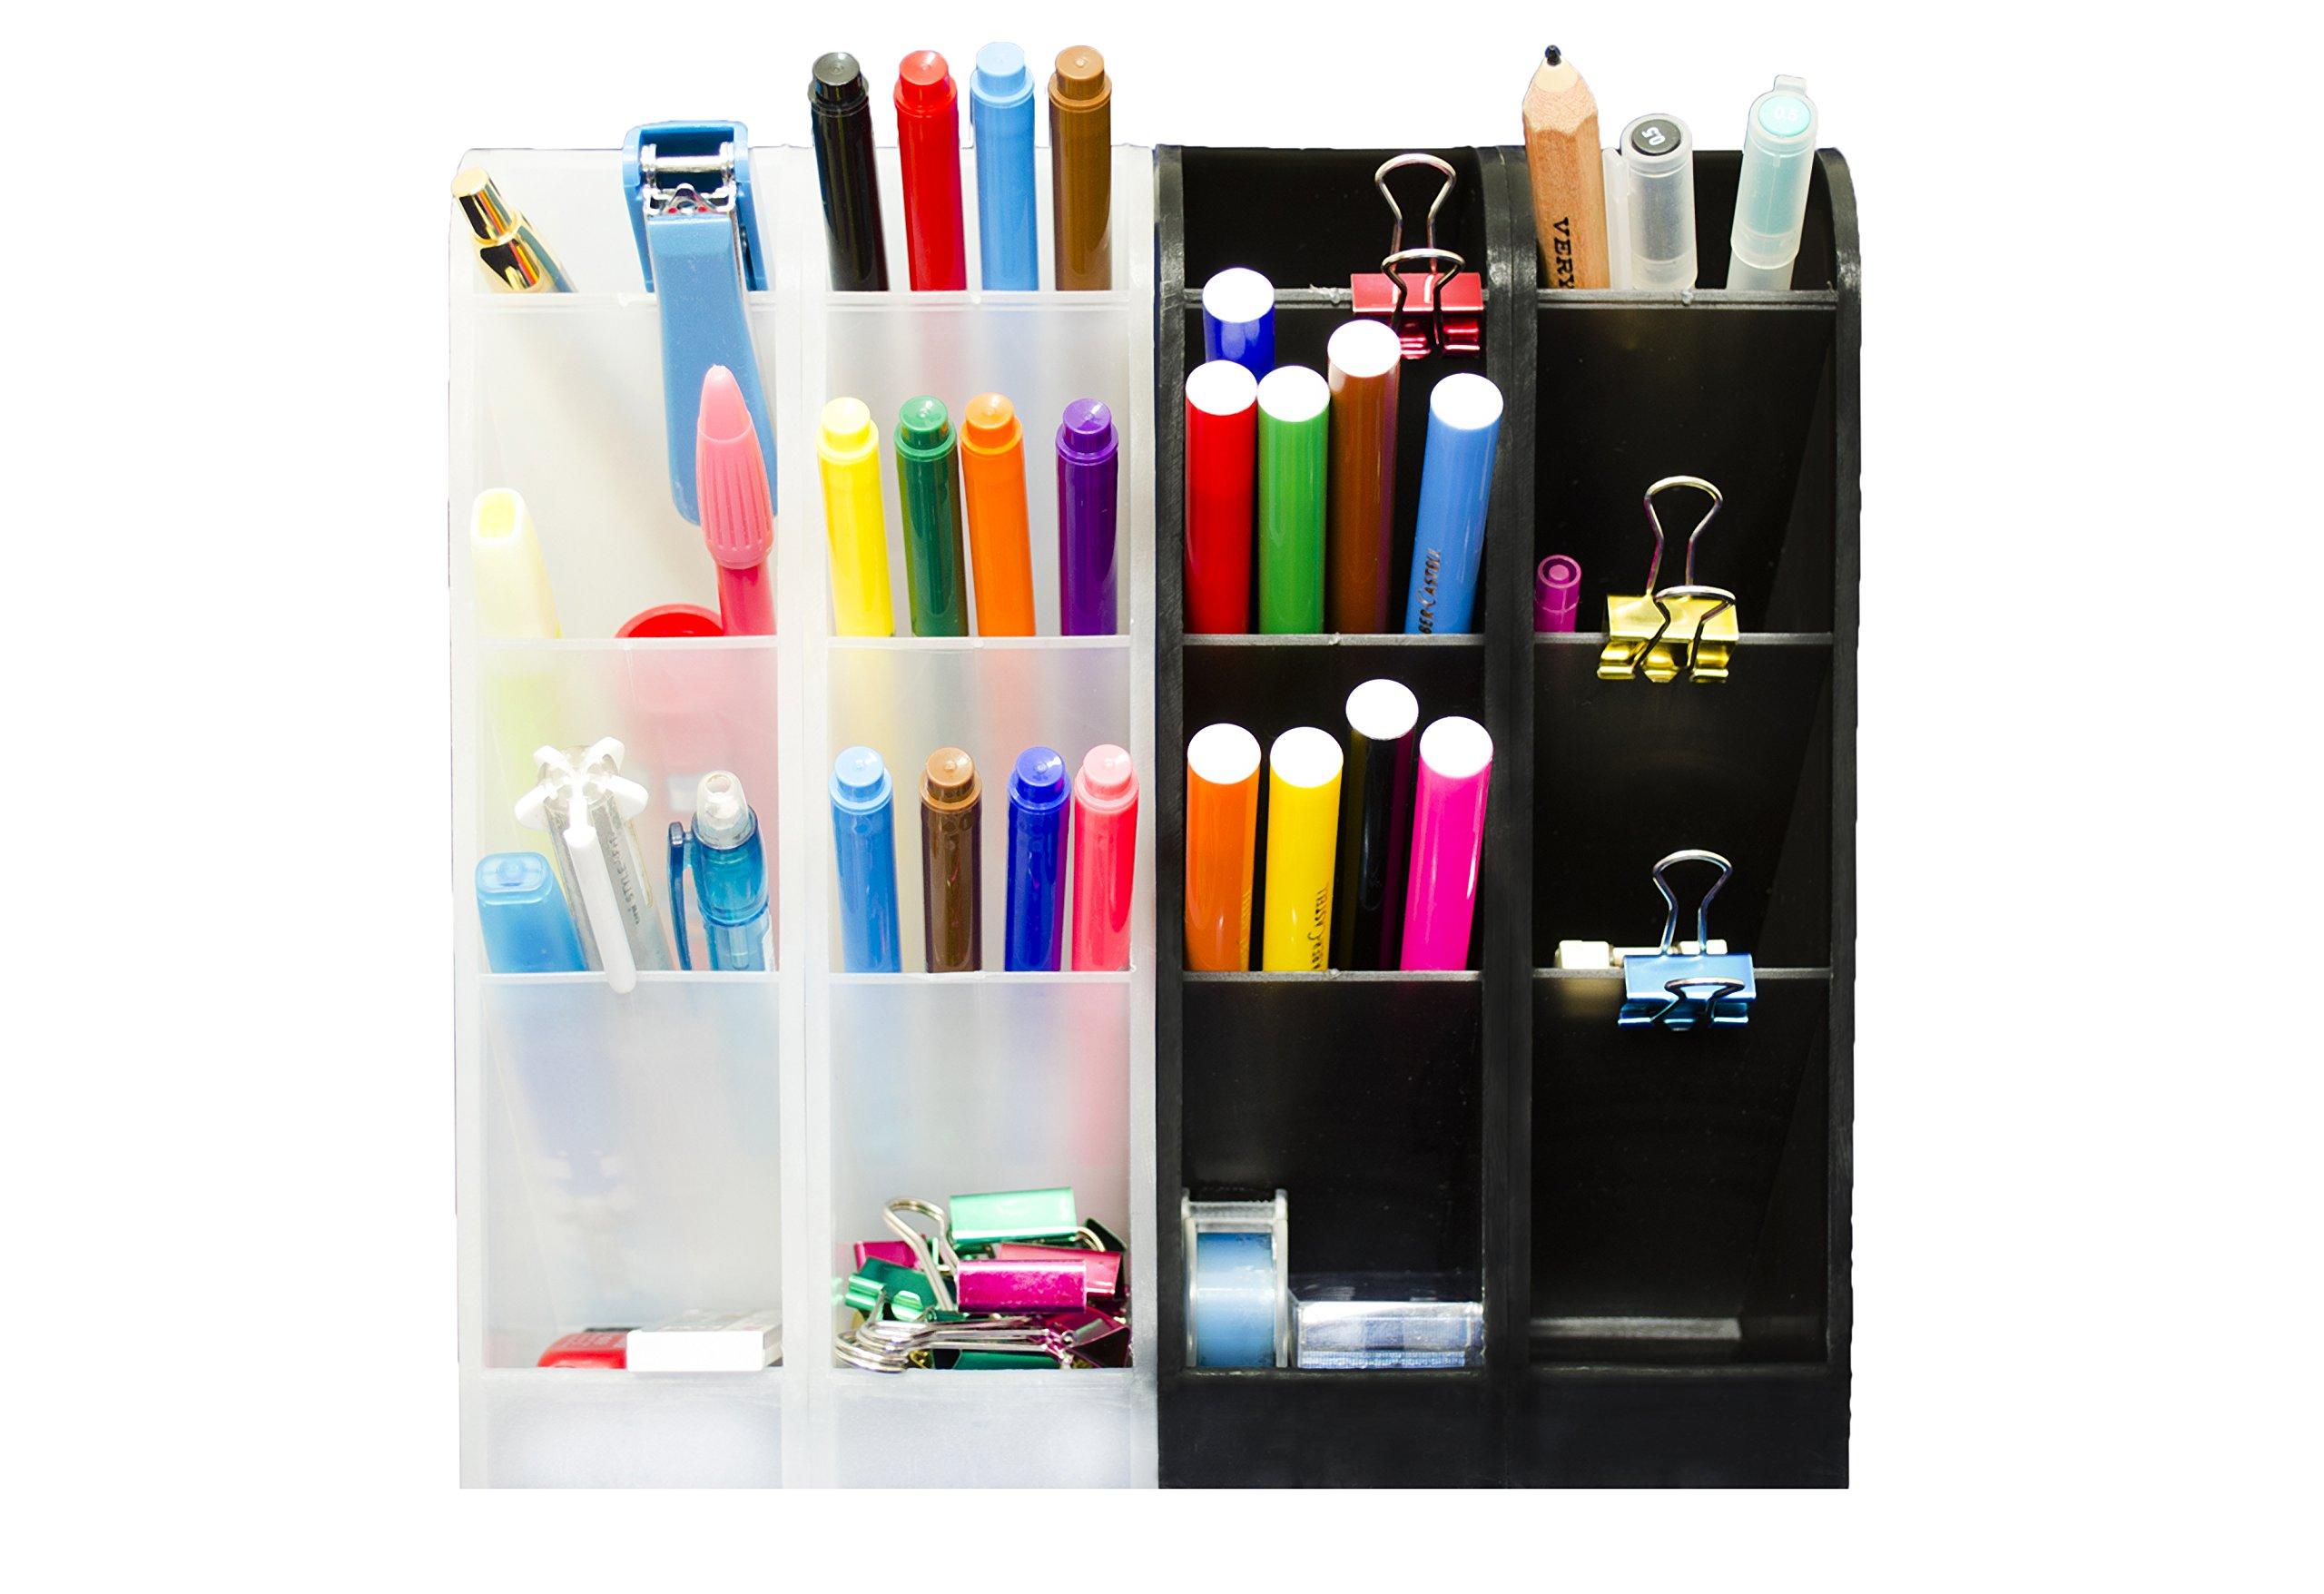 STYLIO Office Desk Organizer - Caddies for Office/Teacher Supplies – Translucent Black & White Caddy Organizer Racks (Set Of 4) Perfect for Desktops